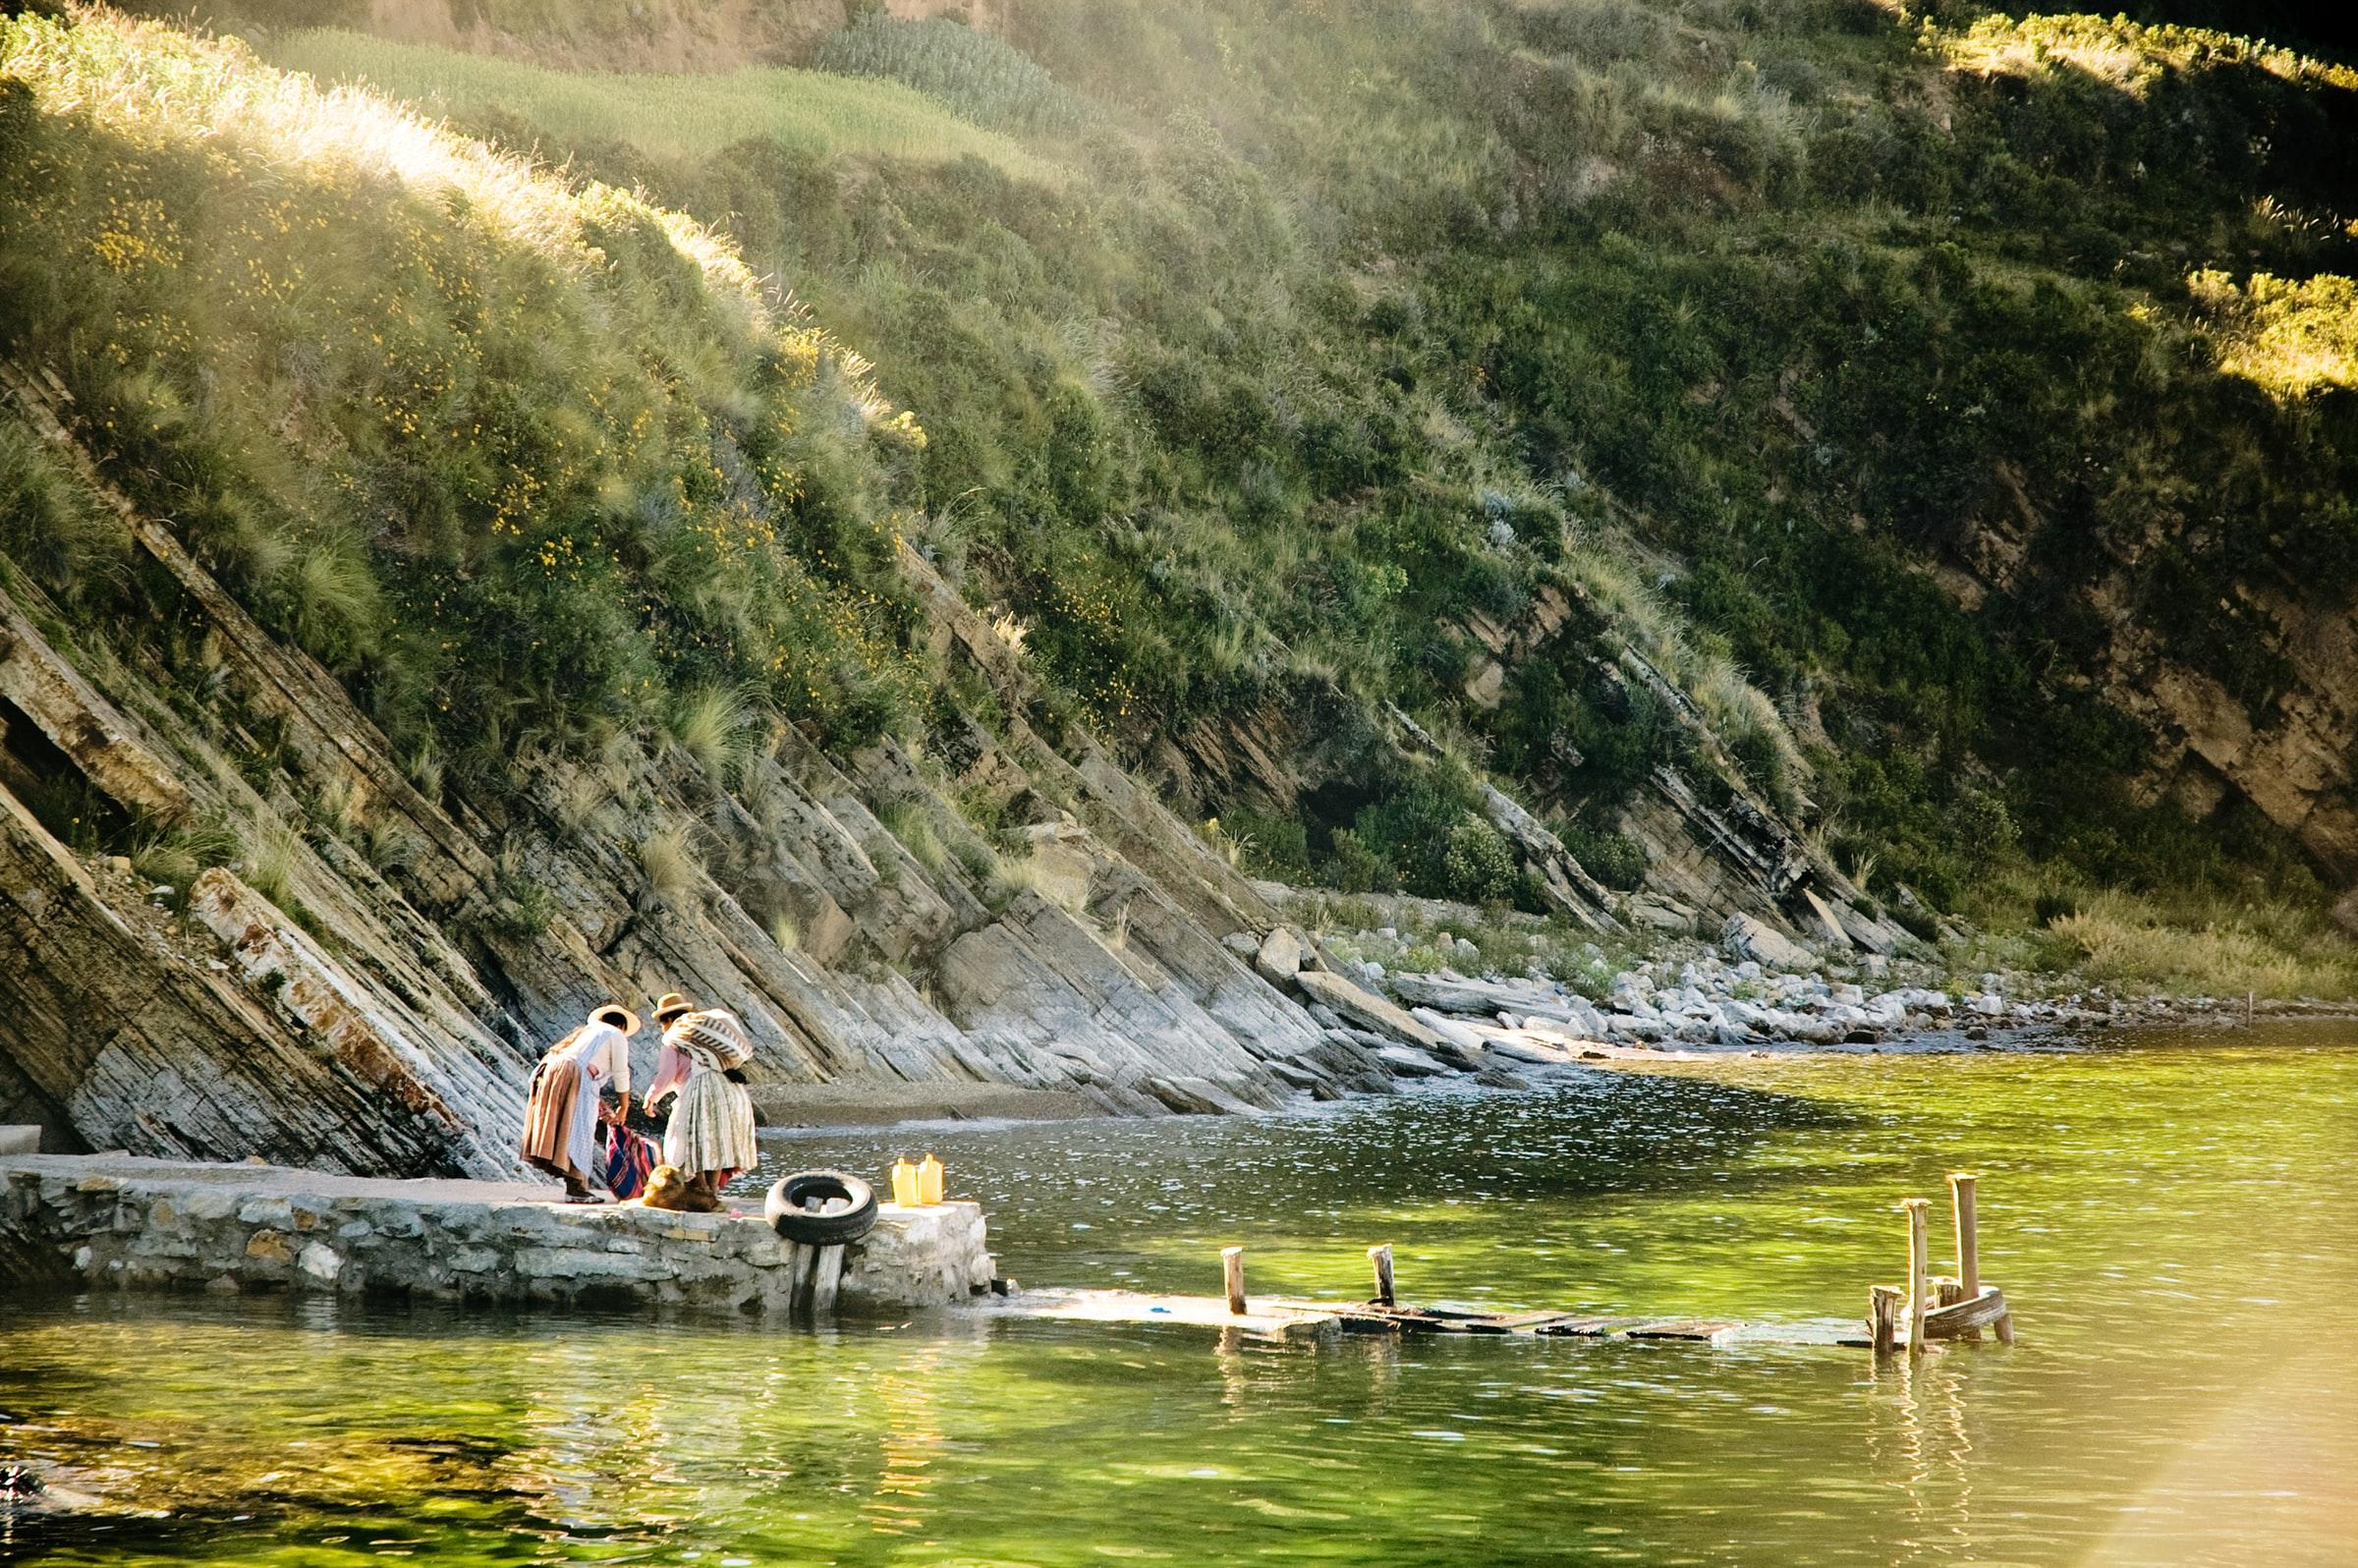 Bolivian Amazon Reina de Enin River Cruise and Death Road